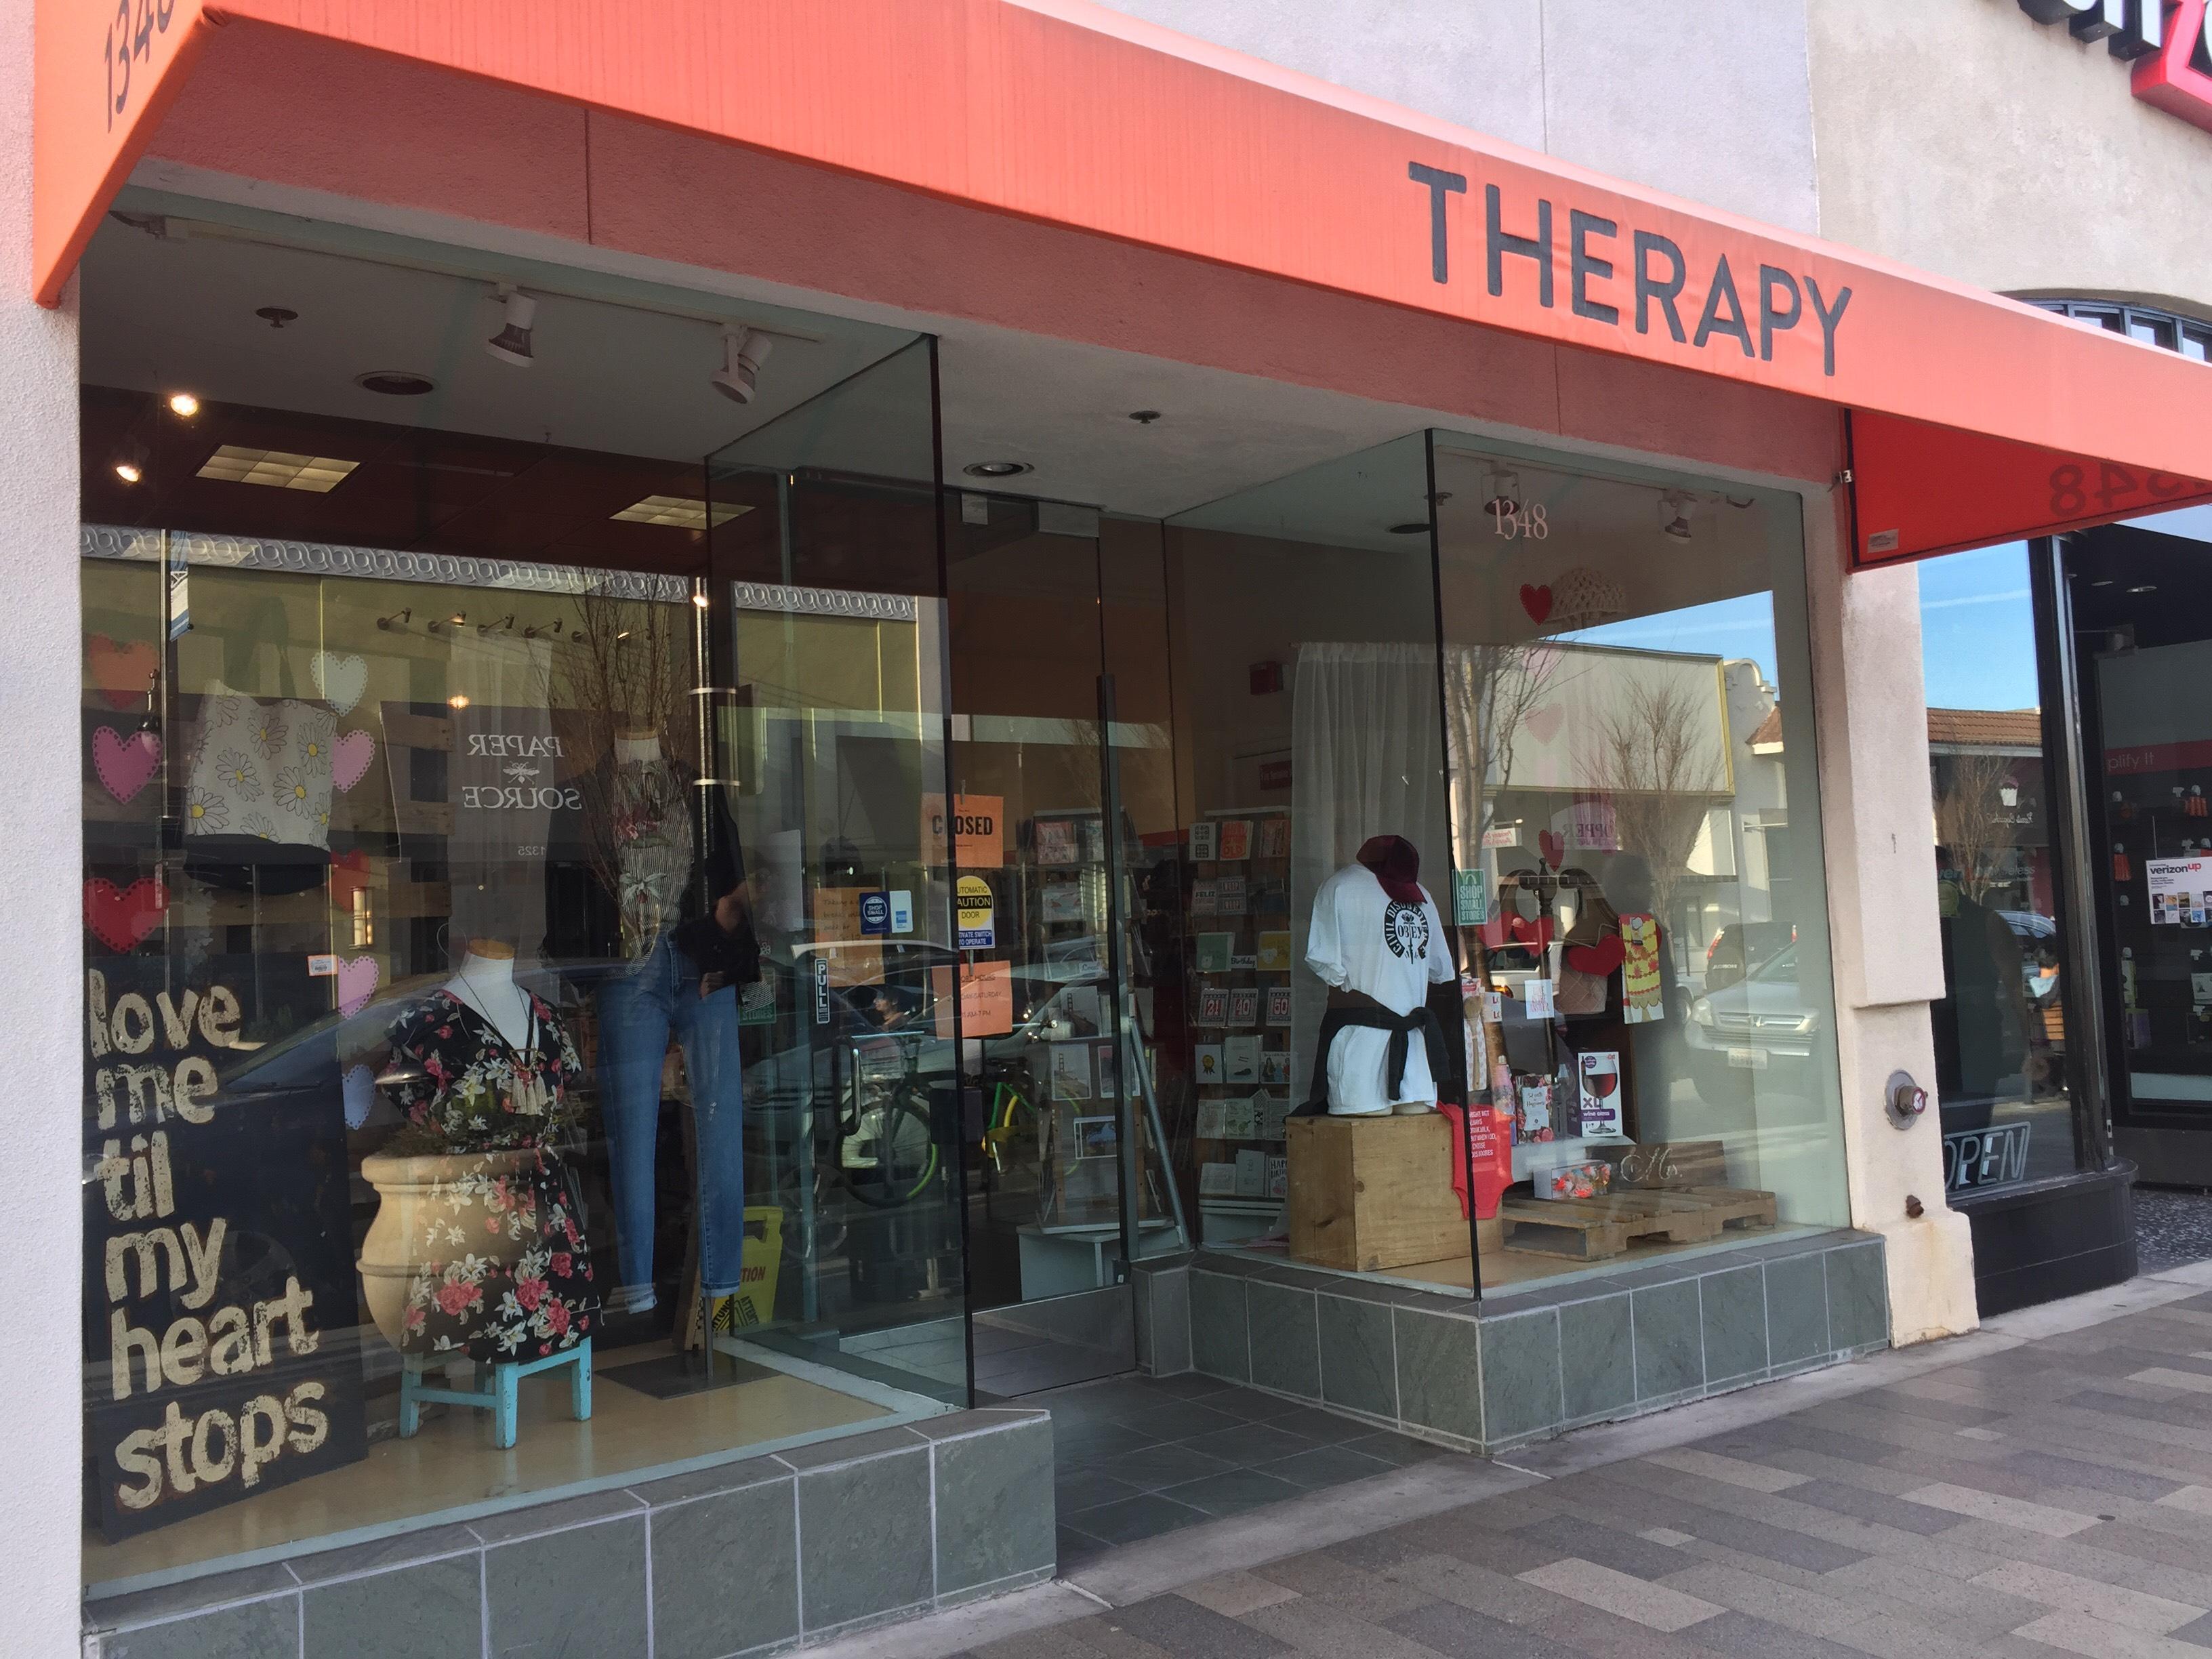 Loja Therapy em Burlingame